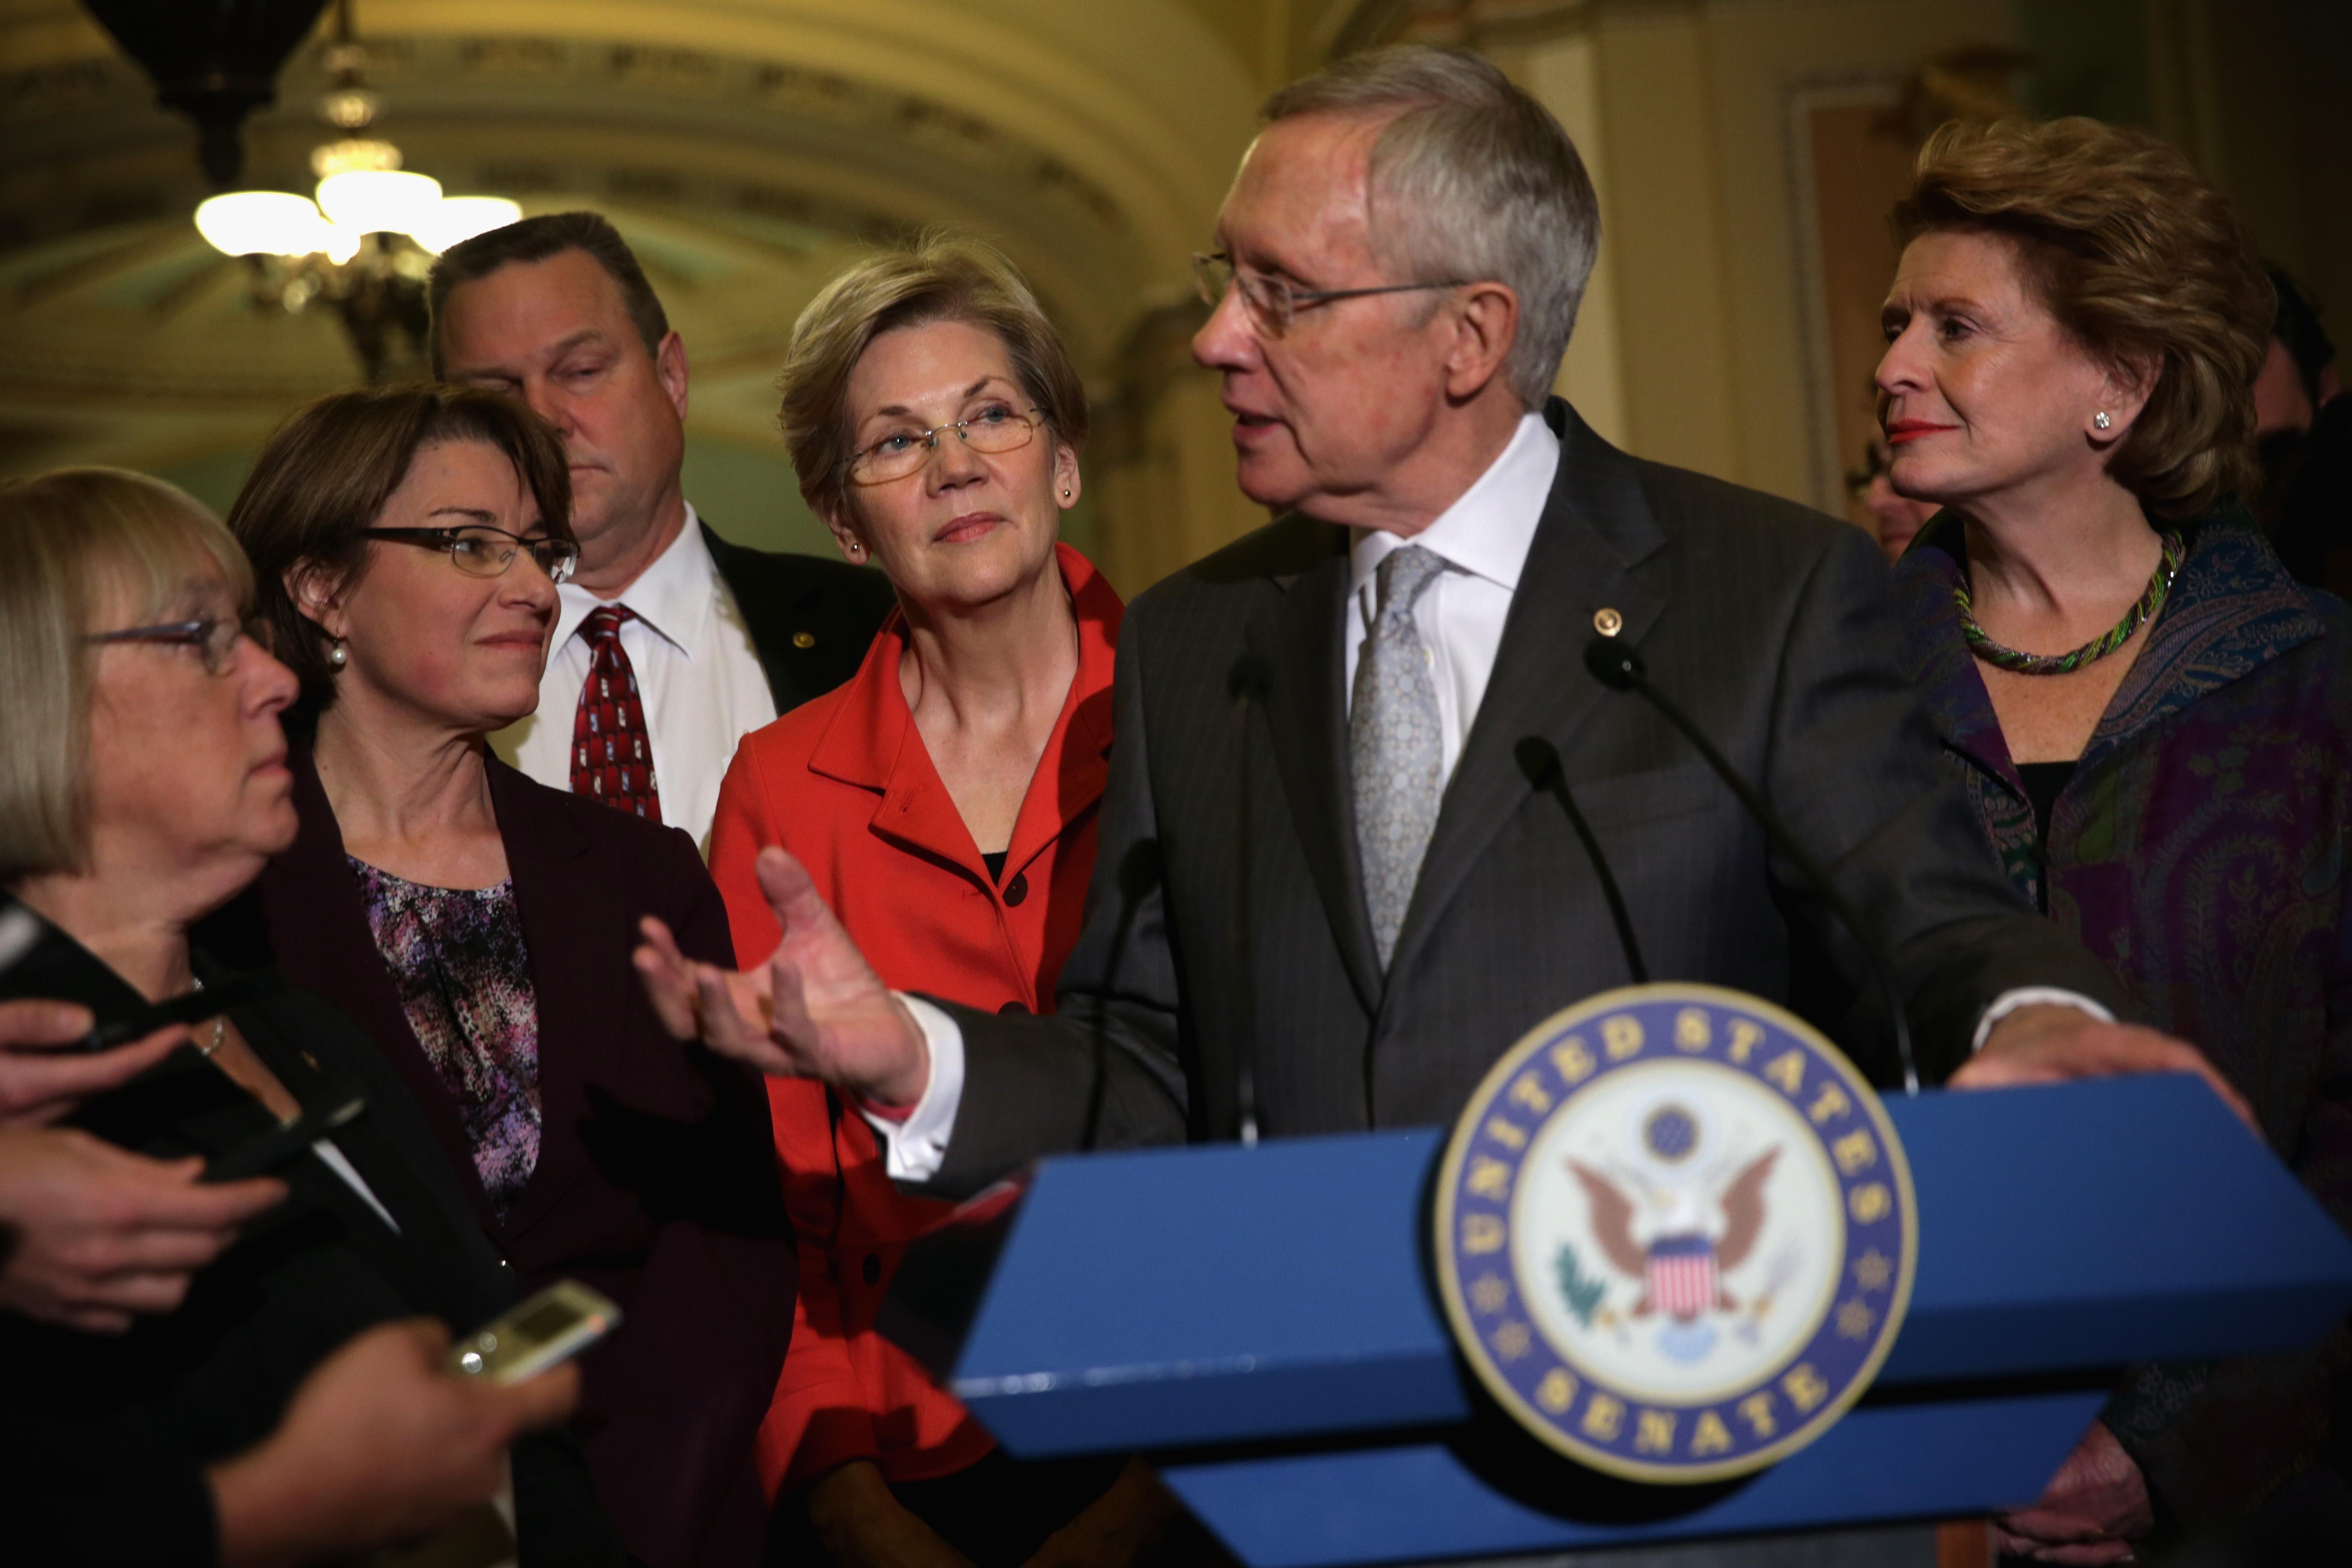 U.S. Senate Majority Leader Sen. Harry Reid (D-NV) (5th L) speaks to members of the media as (L-R) Sen. Patty Murray (D-WA), Sen. Amy Klobuchar (D-MN), Sen. Jon Tester (D-MT), Sen. Elizabeth Warren (D-MA), and Sen. Debbie Stabenow (D-MI) listen. (Alex Wong/Getty Images)